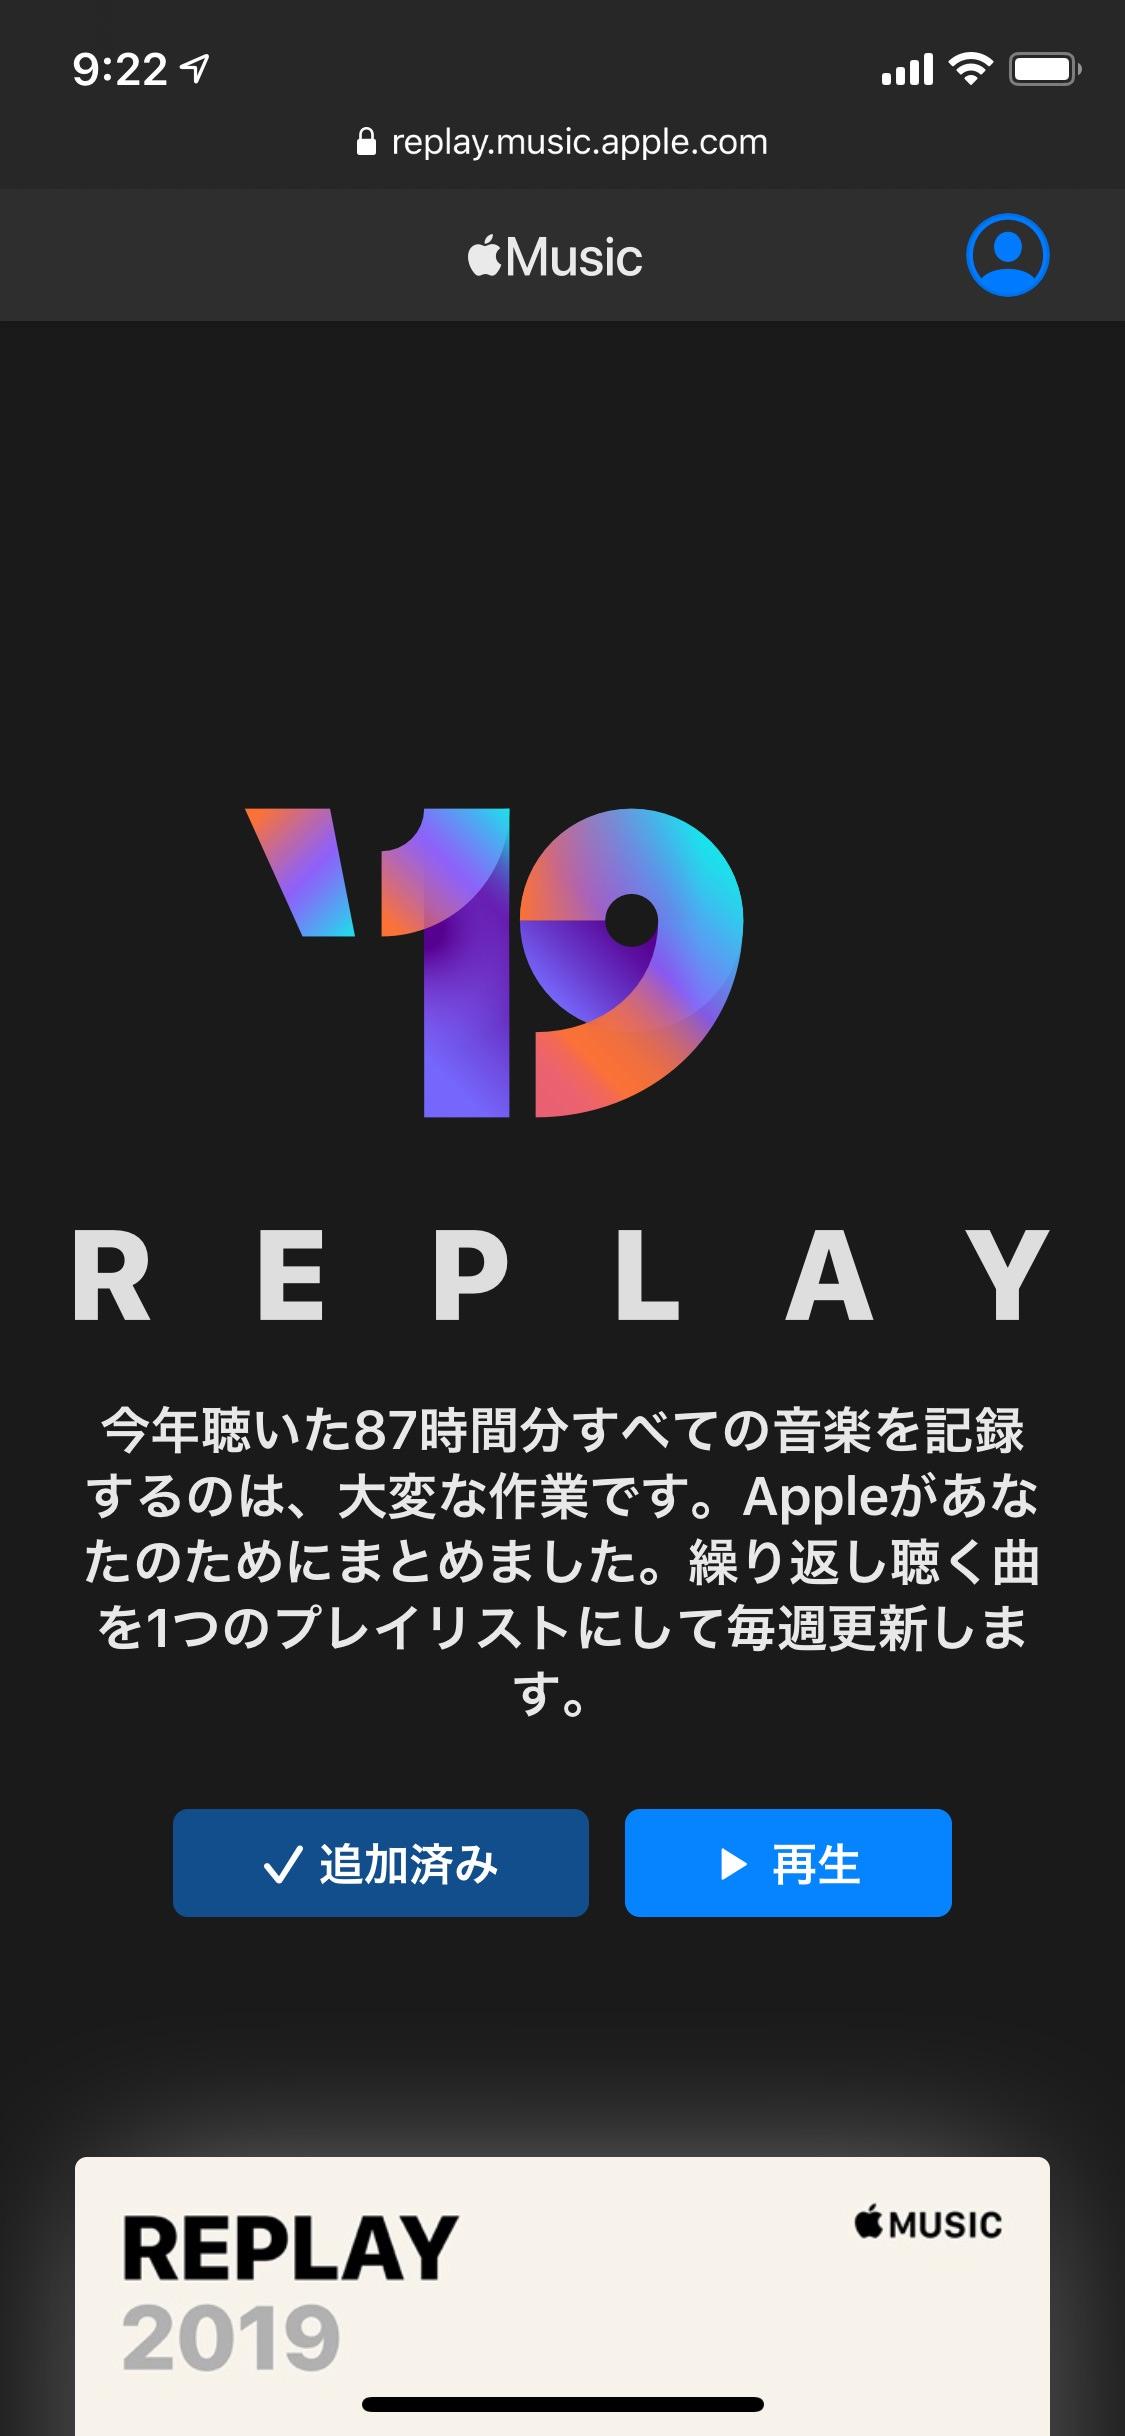 apple-music-replay-2019-3